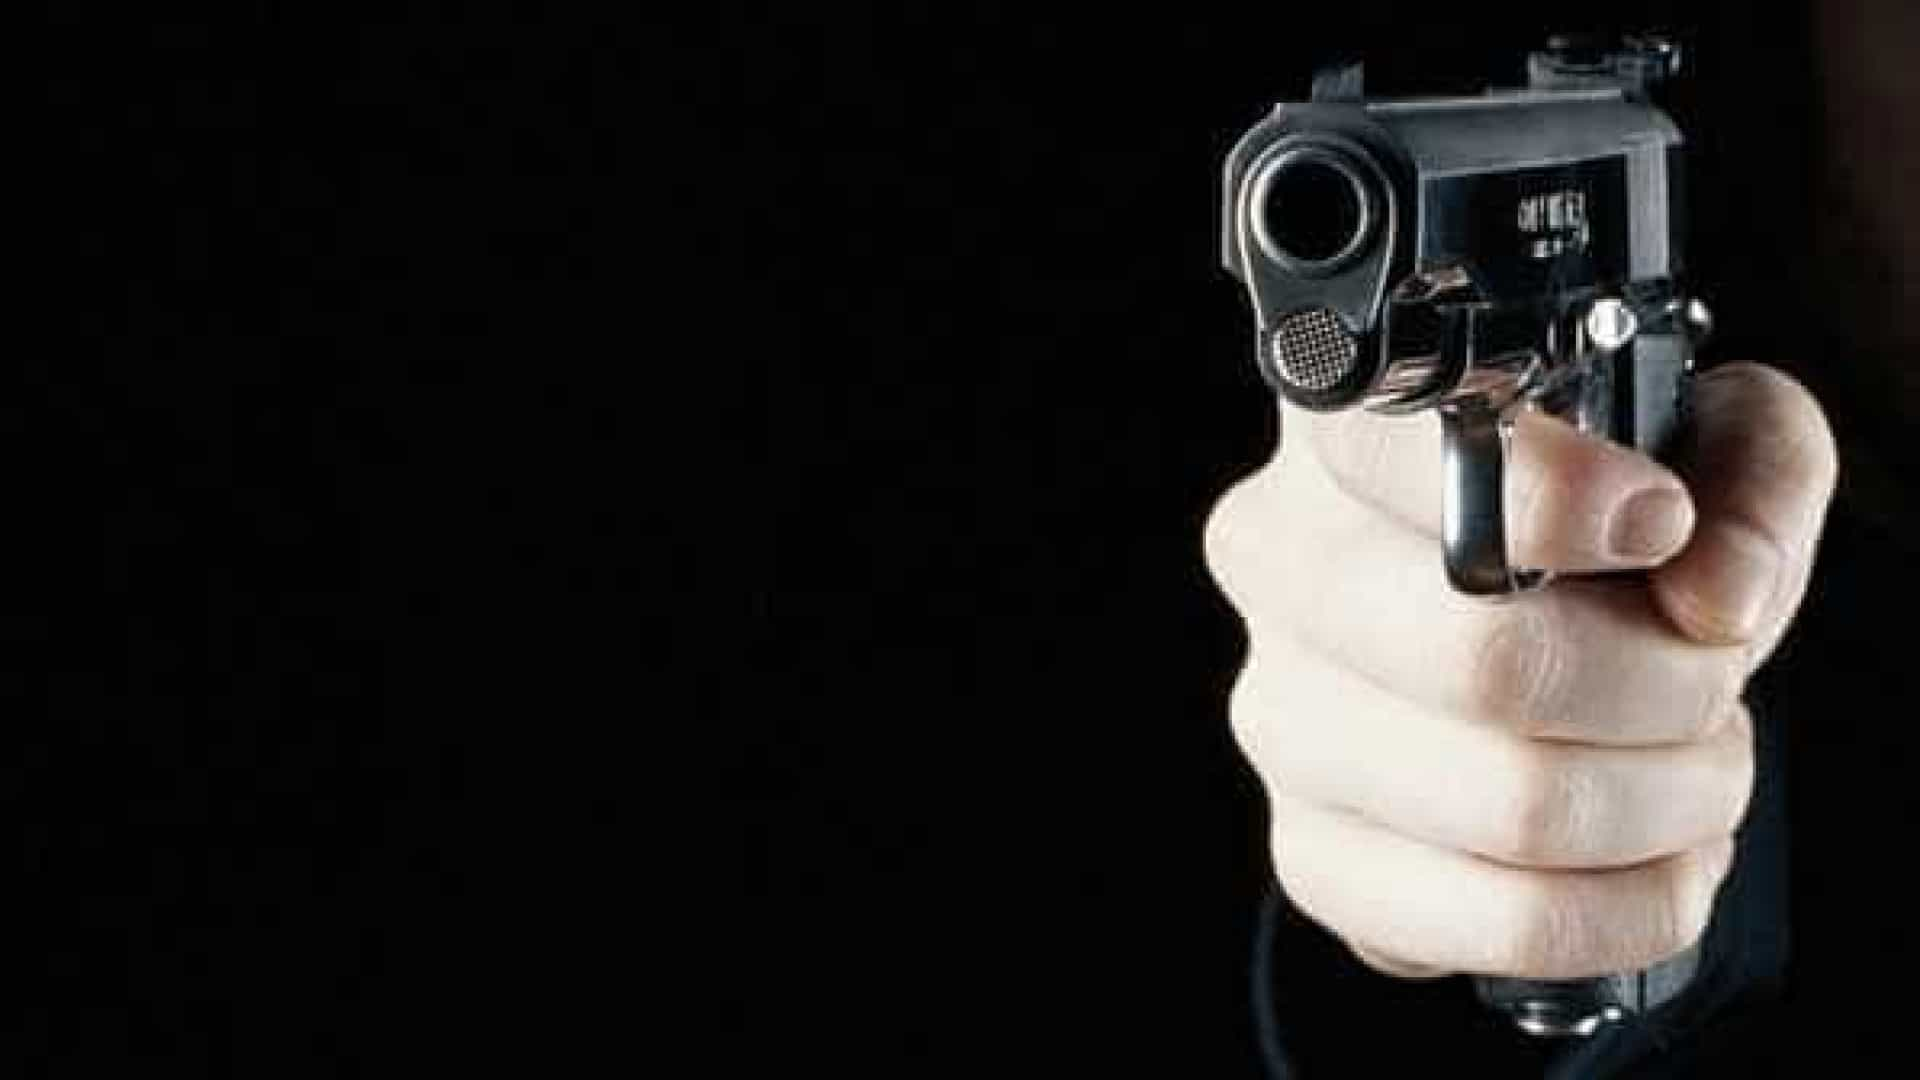 SP: número de roubos cresce  pelo oitavo mês consecutivo